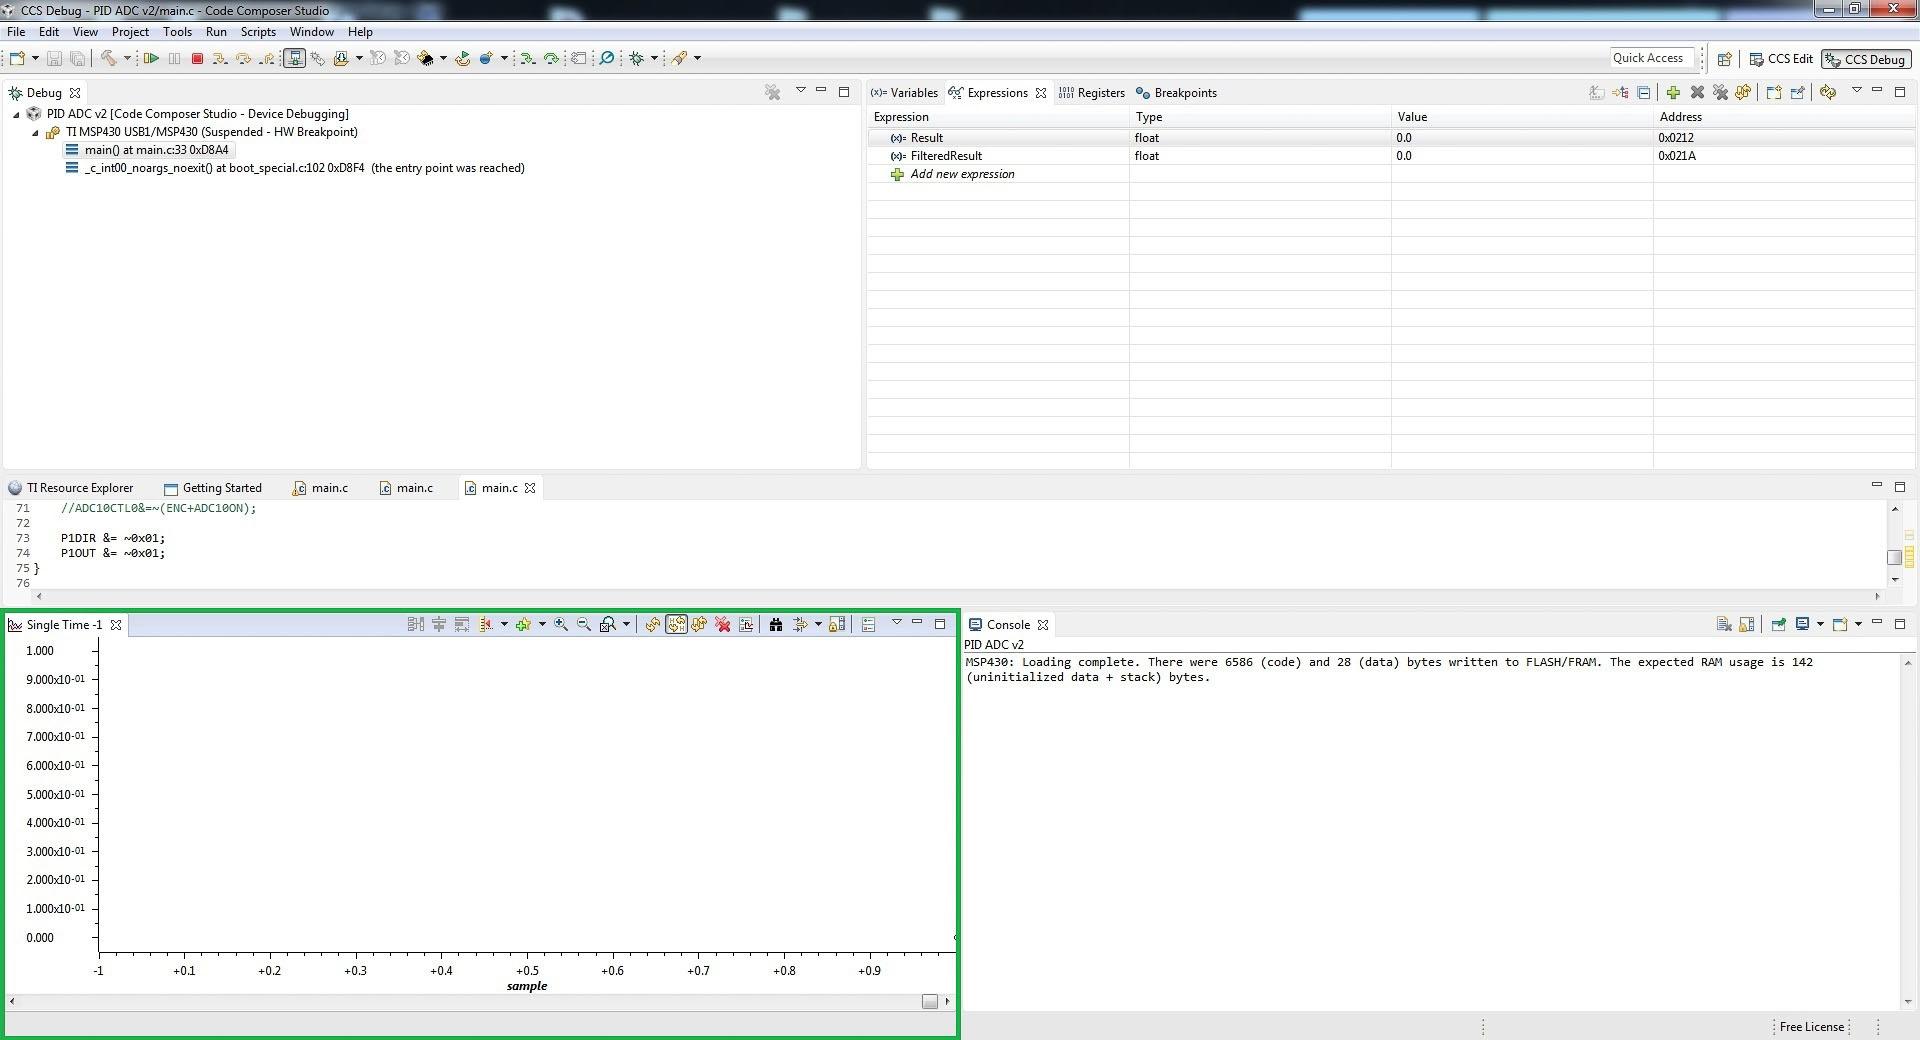 Code Composer Studio Graphing Tool Tutorial